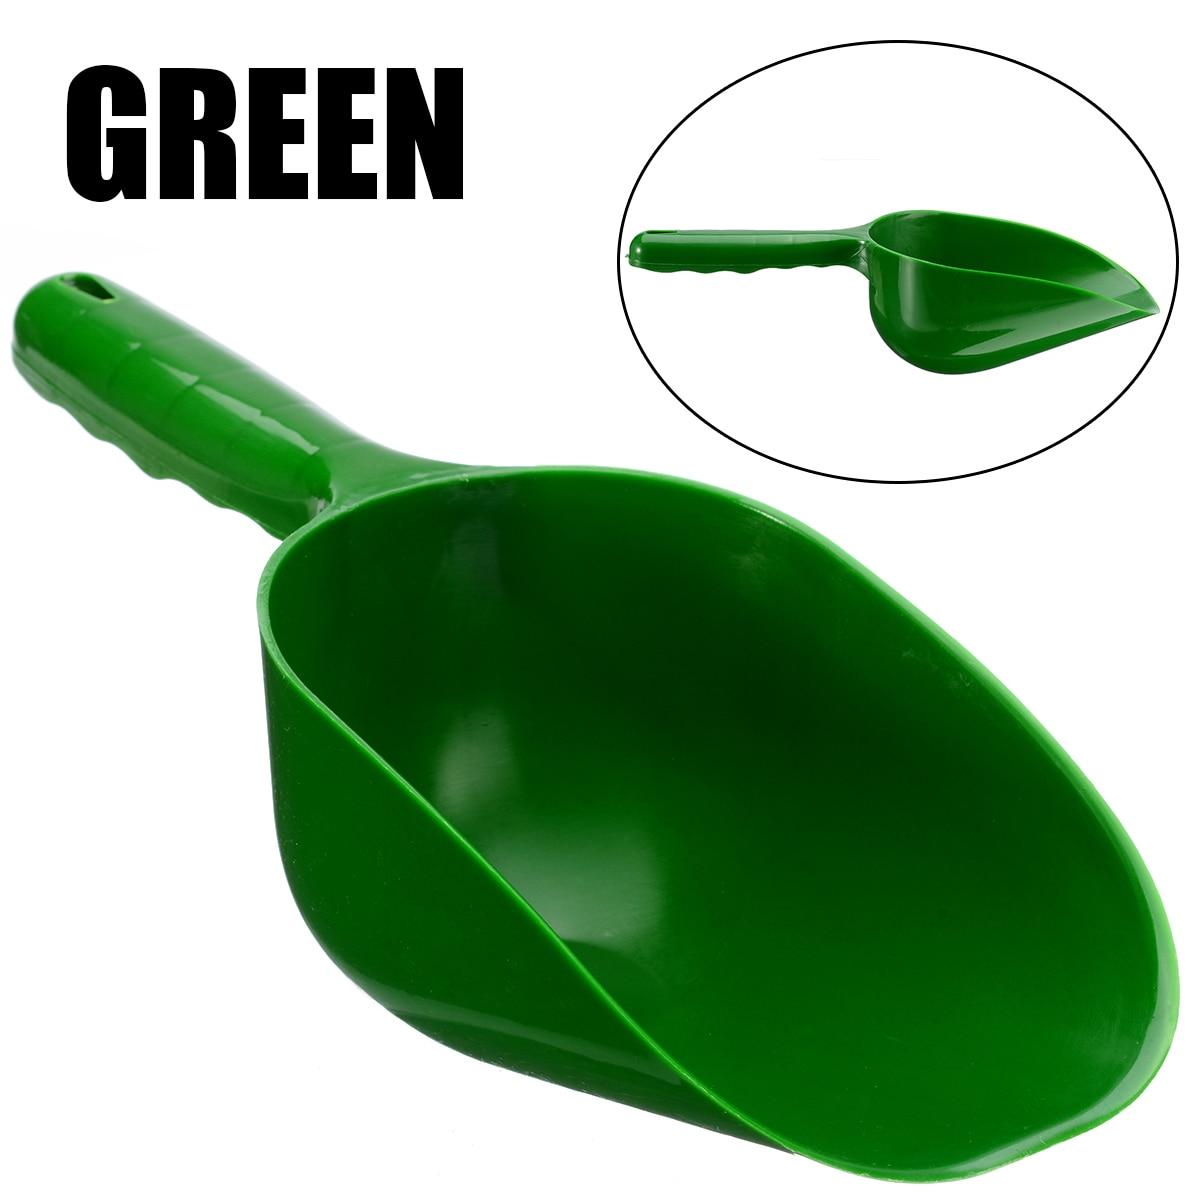 Garden Scoop Multi-function Soil Plastic Shovel Spoons Digging ultivation Tool